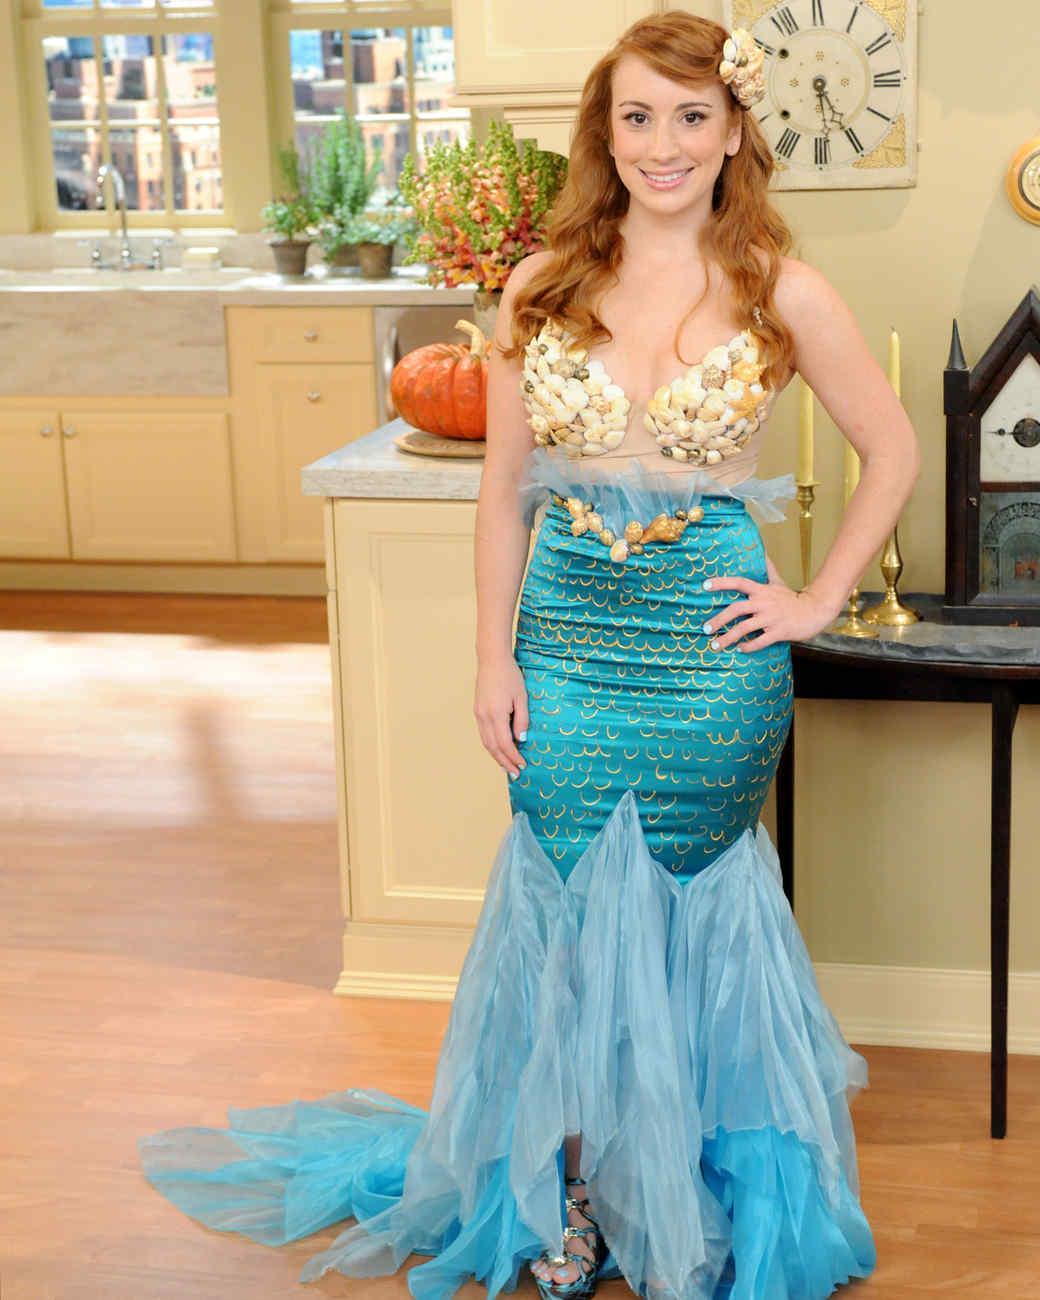 Mermaid costume video martha stewart mermaid costume solutioingenieria Choice Image